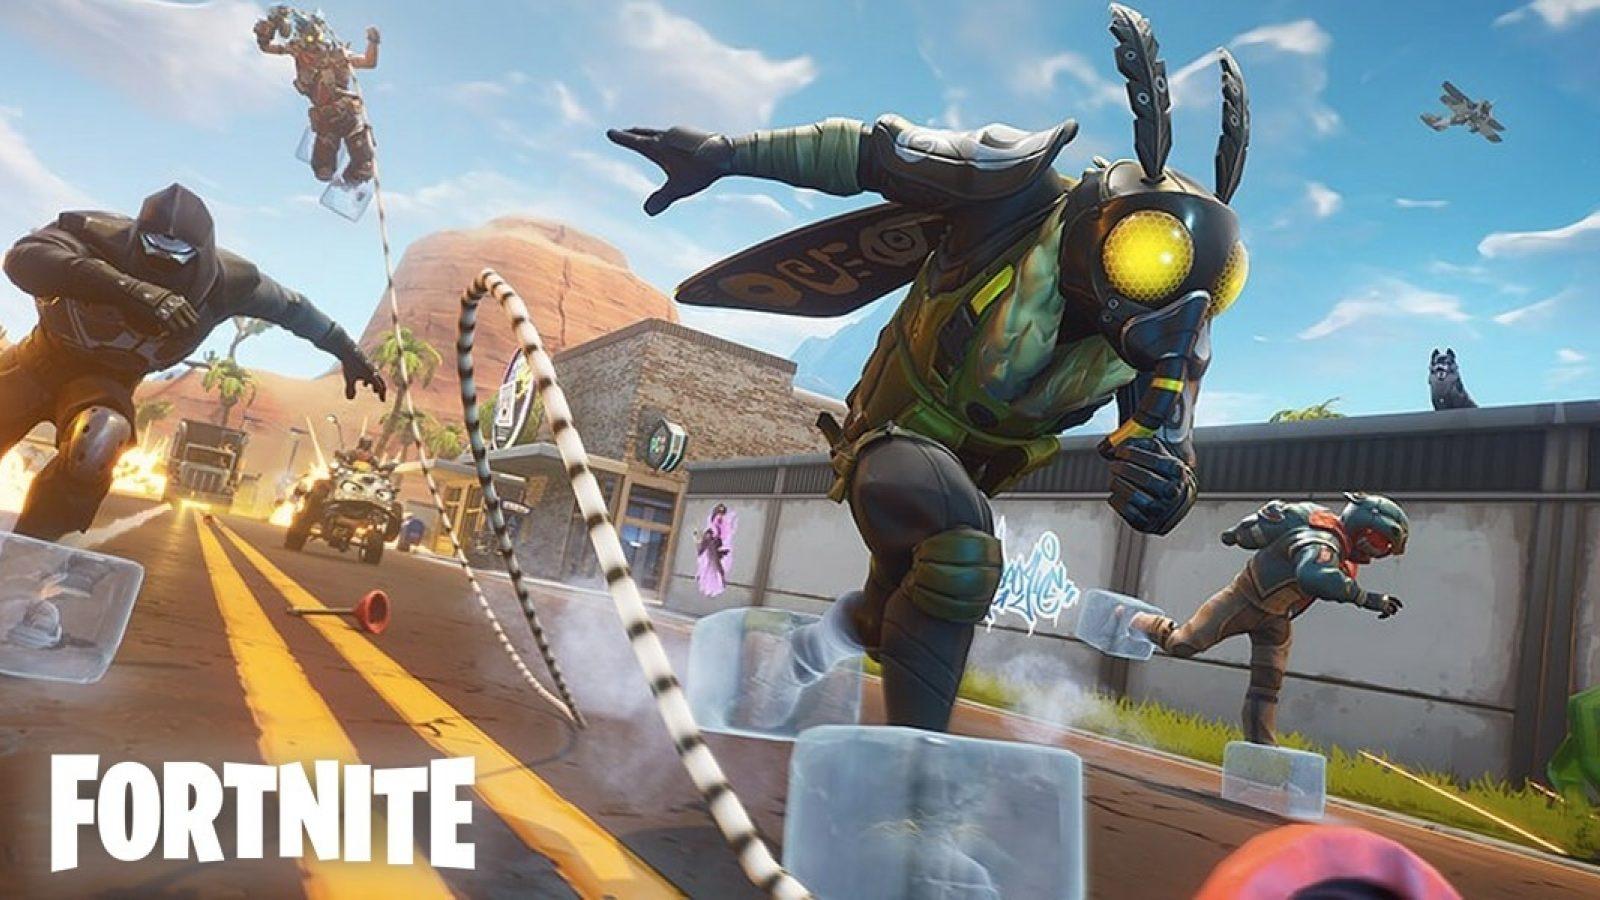 fortnite slide solo limited time mode is live 14 days of fortnite